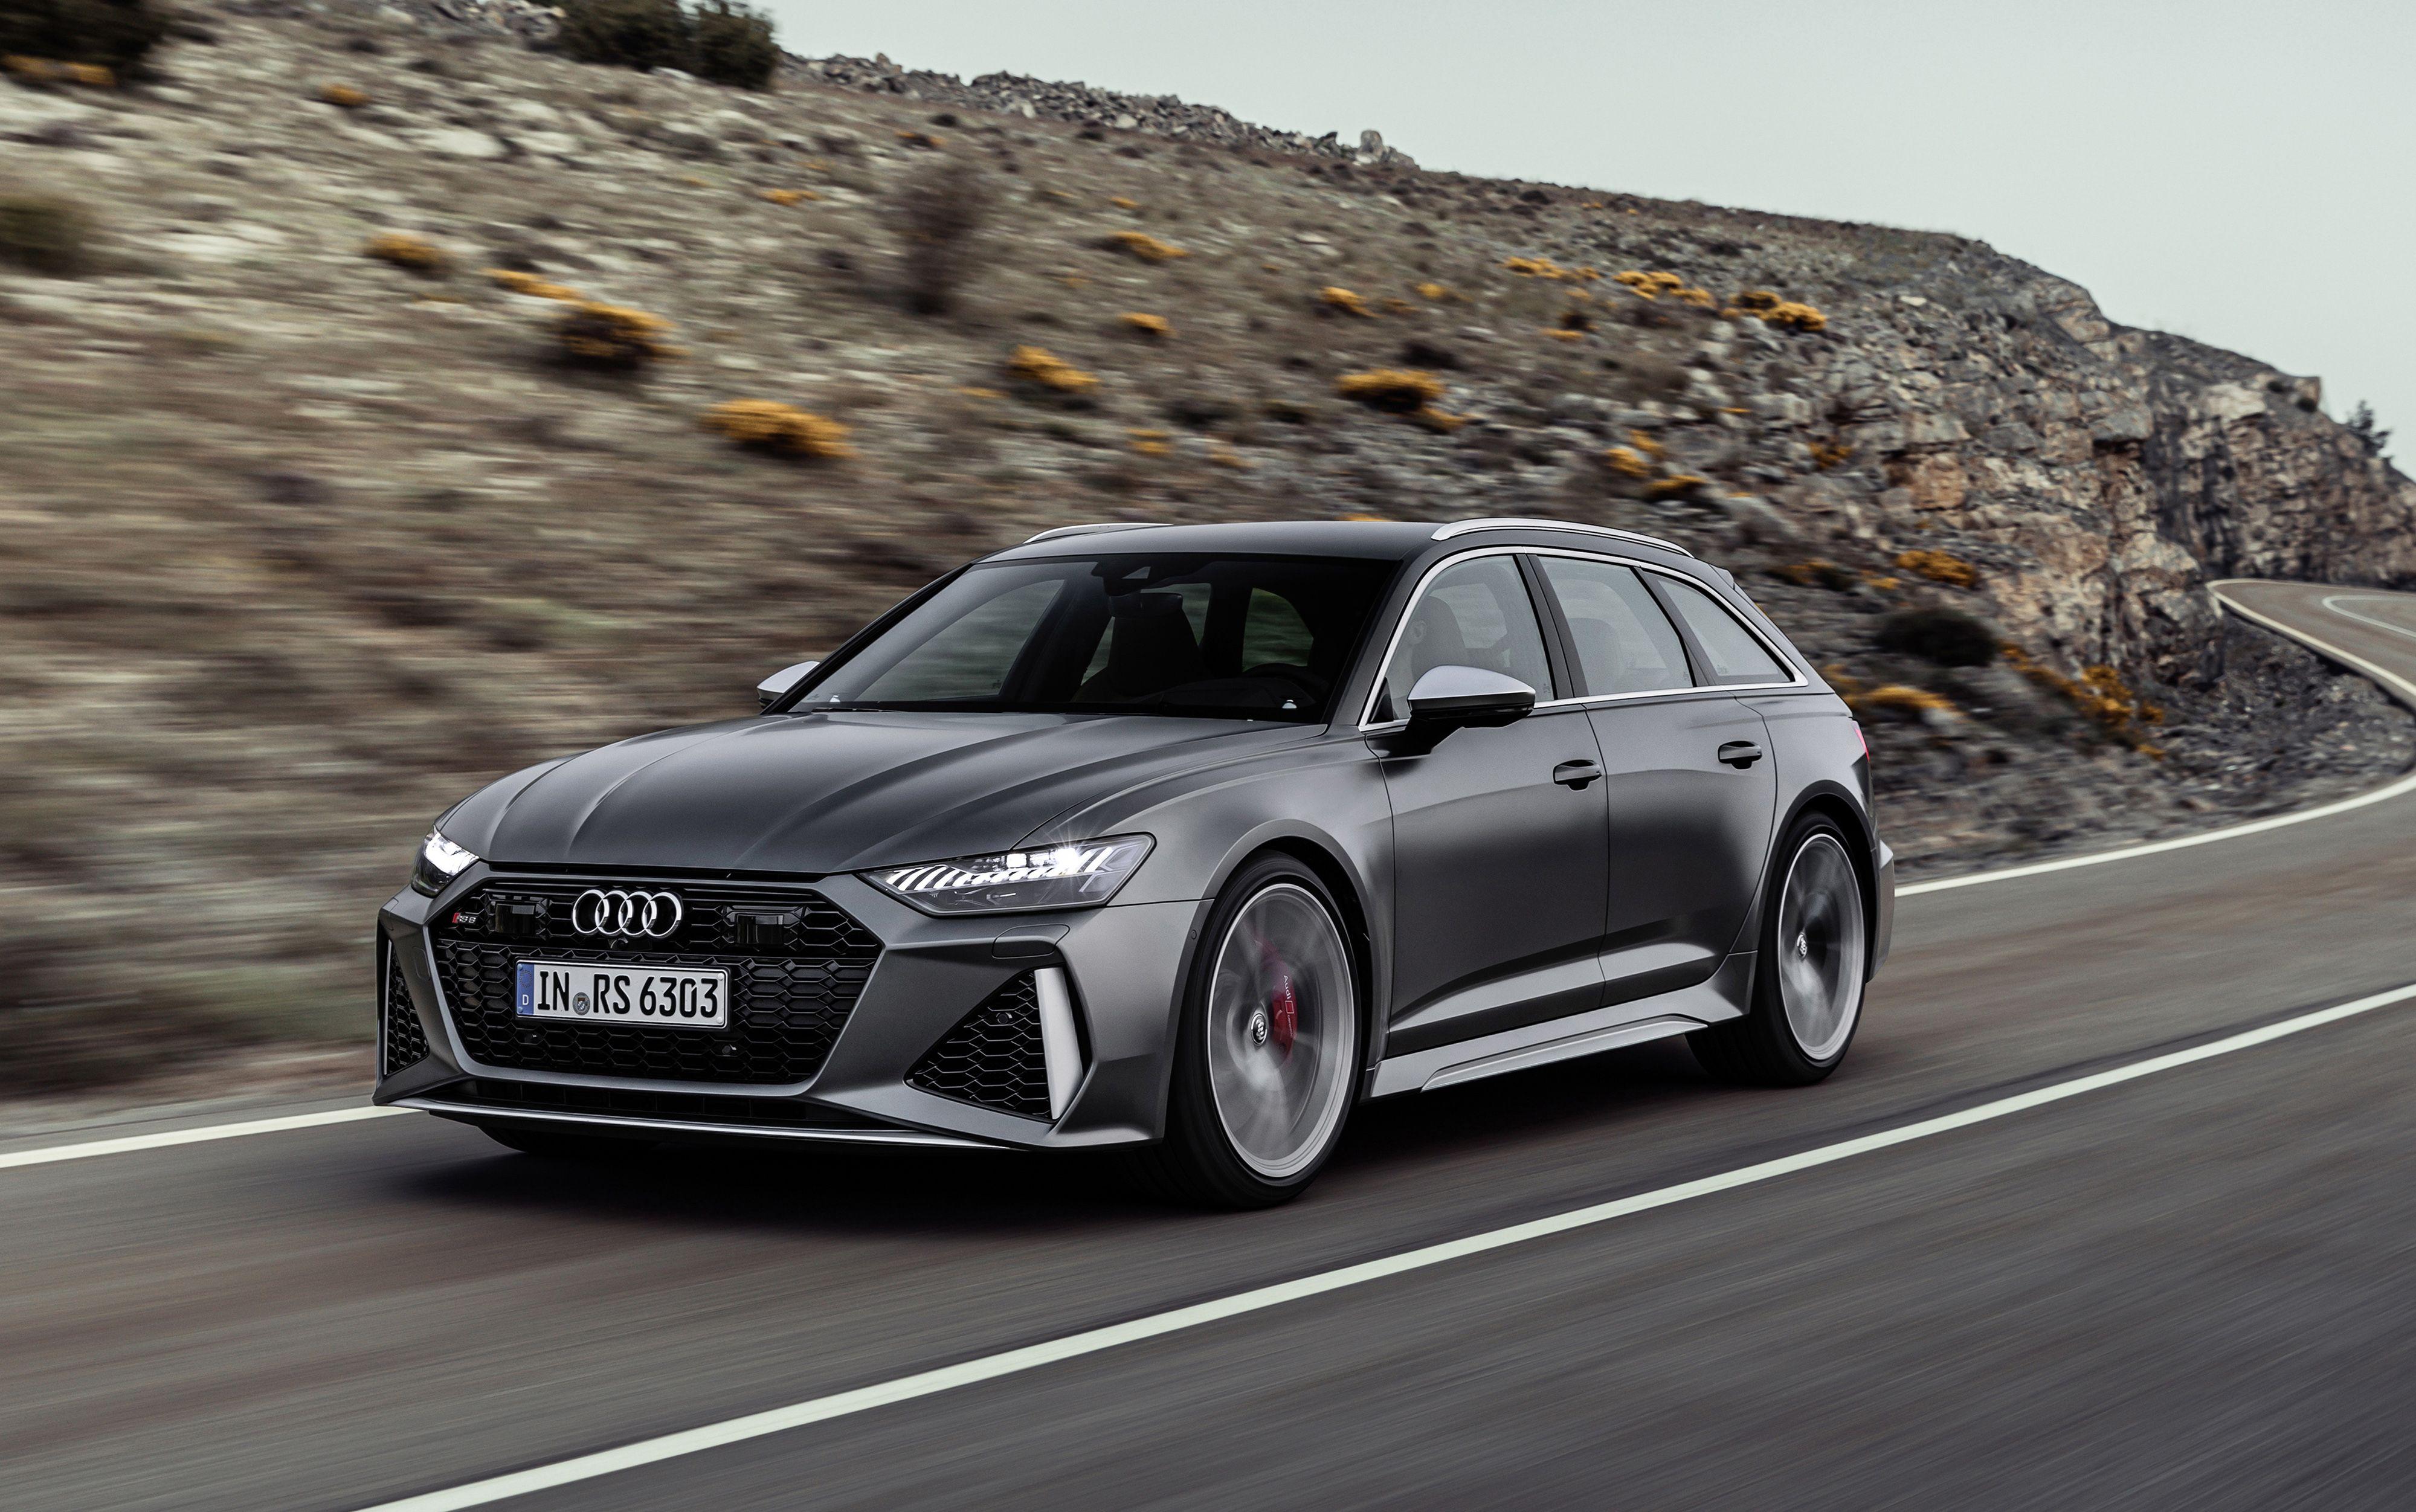 Kelebihan Audi Rs6 Quattro Review